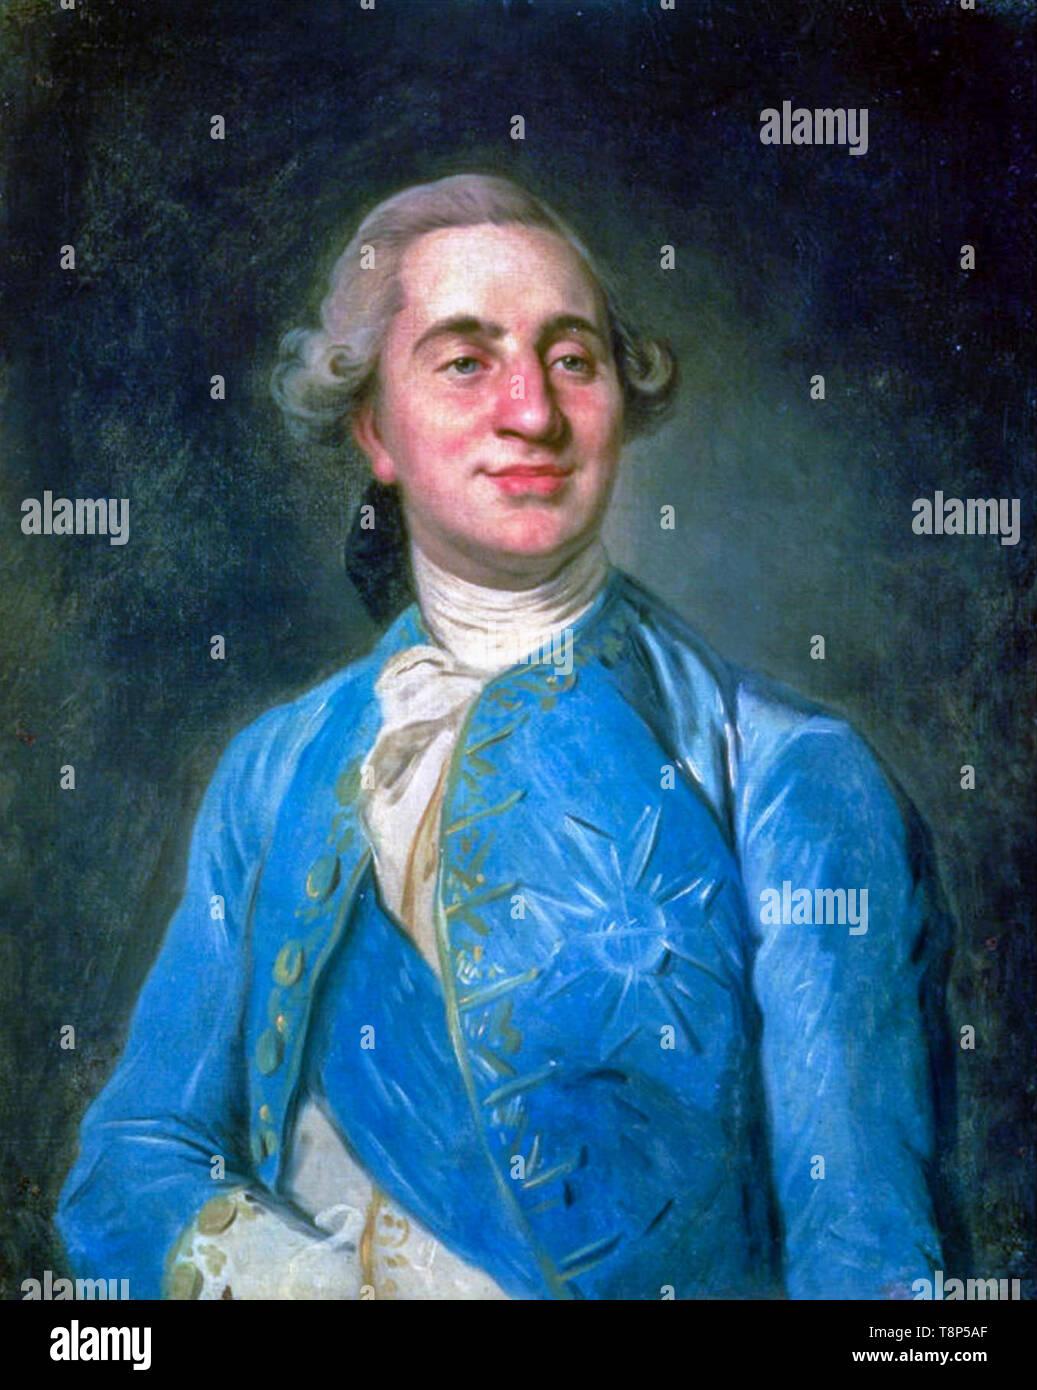 Joseph Duplessis, Louis XVI of France, portrait, painting, 1775 - Stock Image